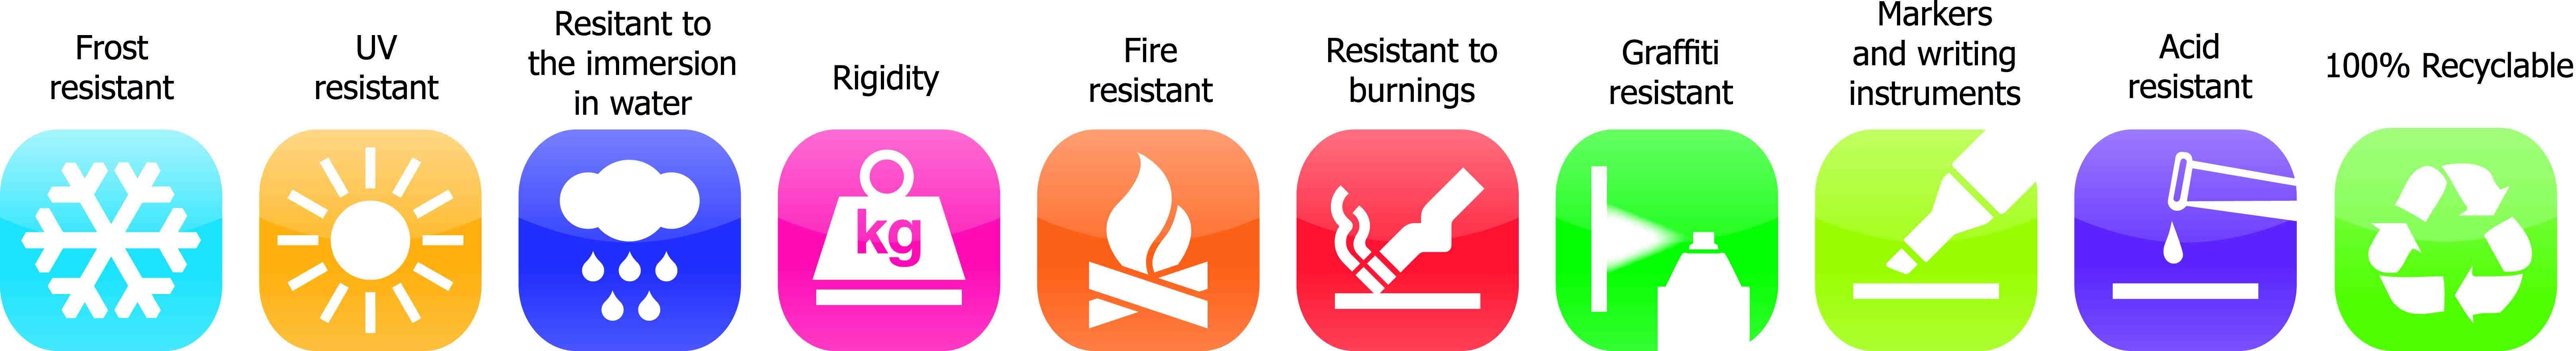 resistance symbols